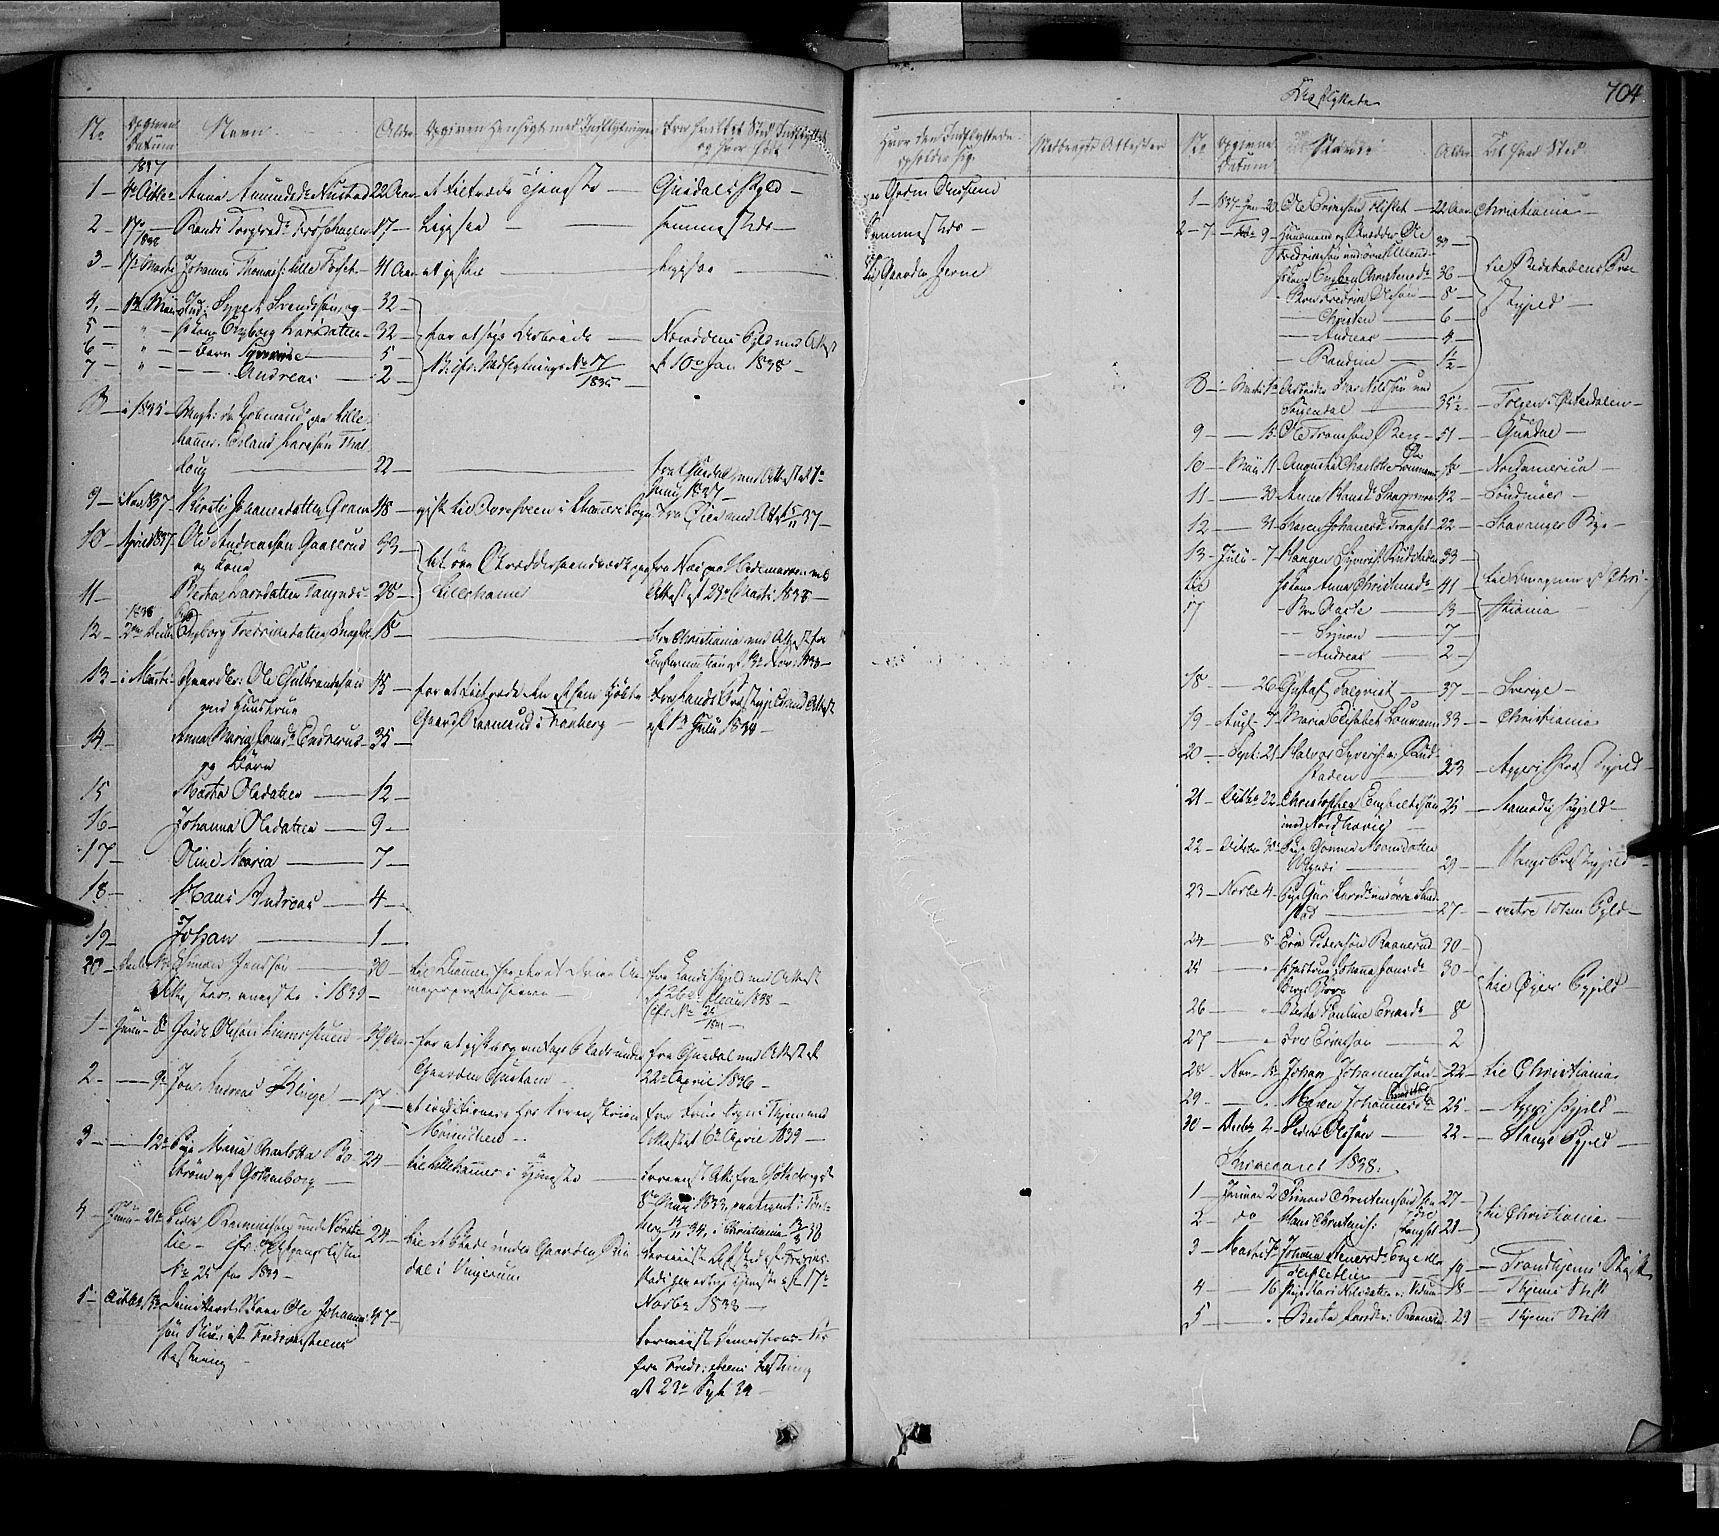 SAH, Fåberg prestekontor, Ministerialbok nr. 5, 1836-1854, s. 703-704